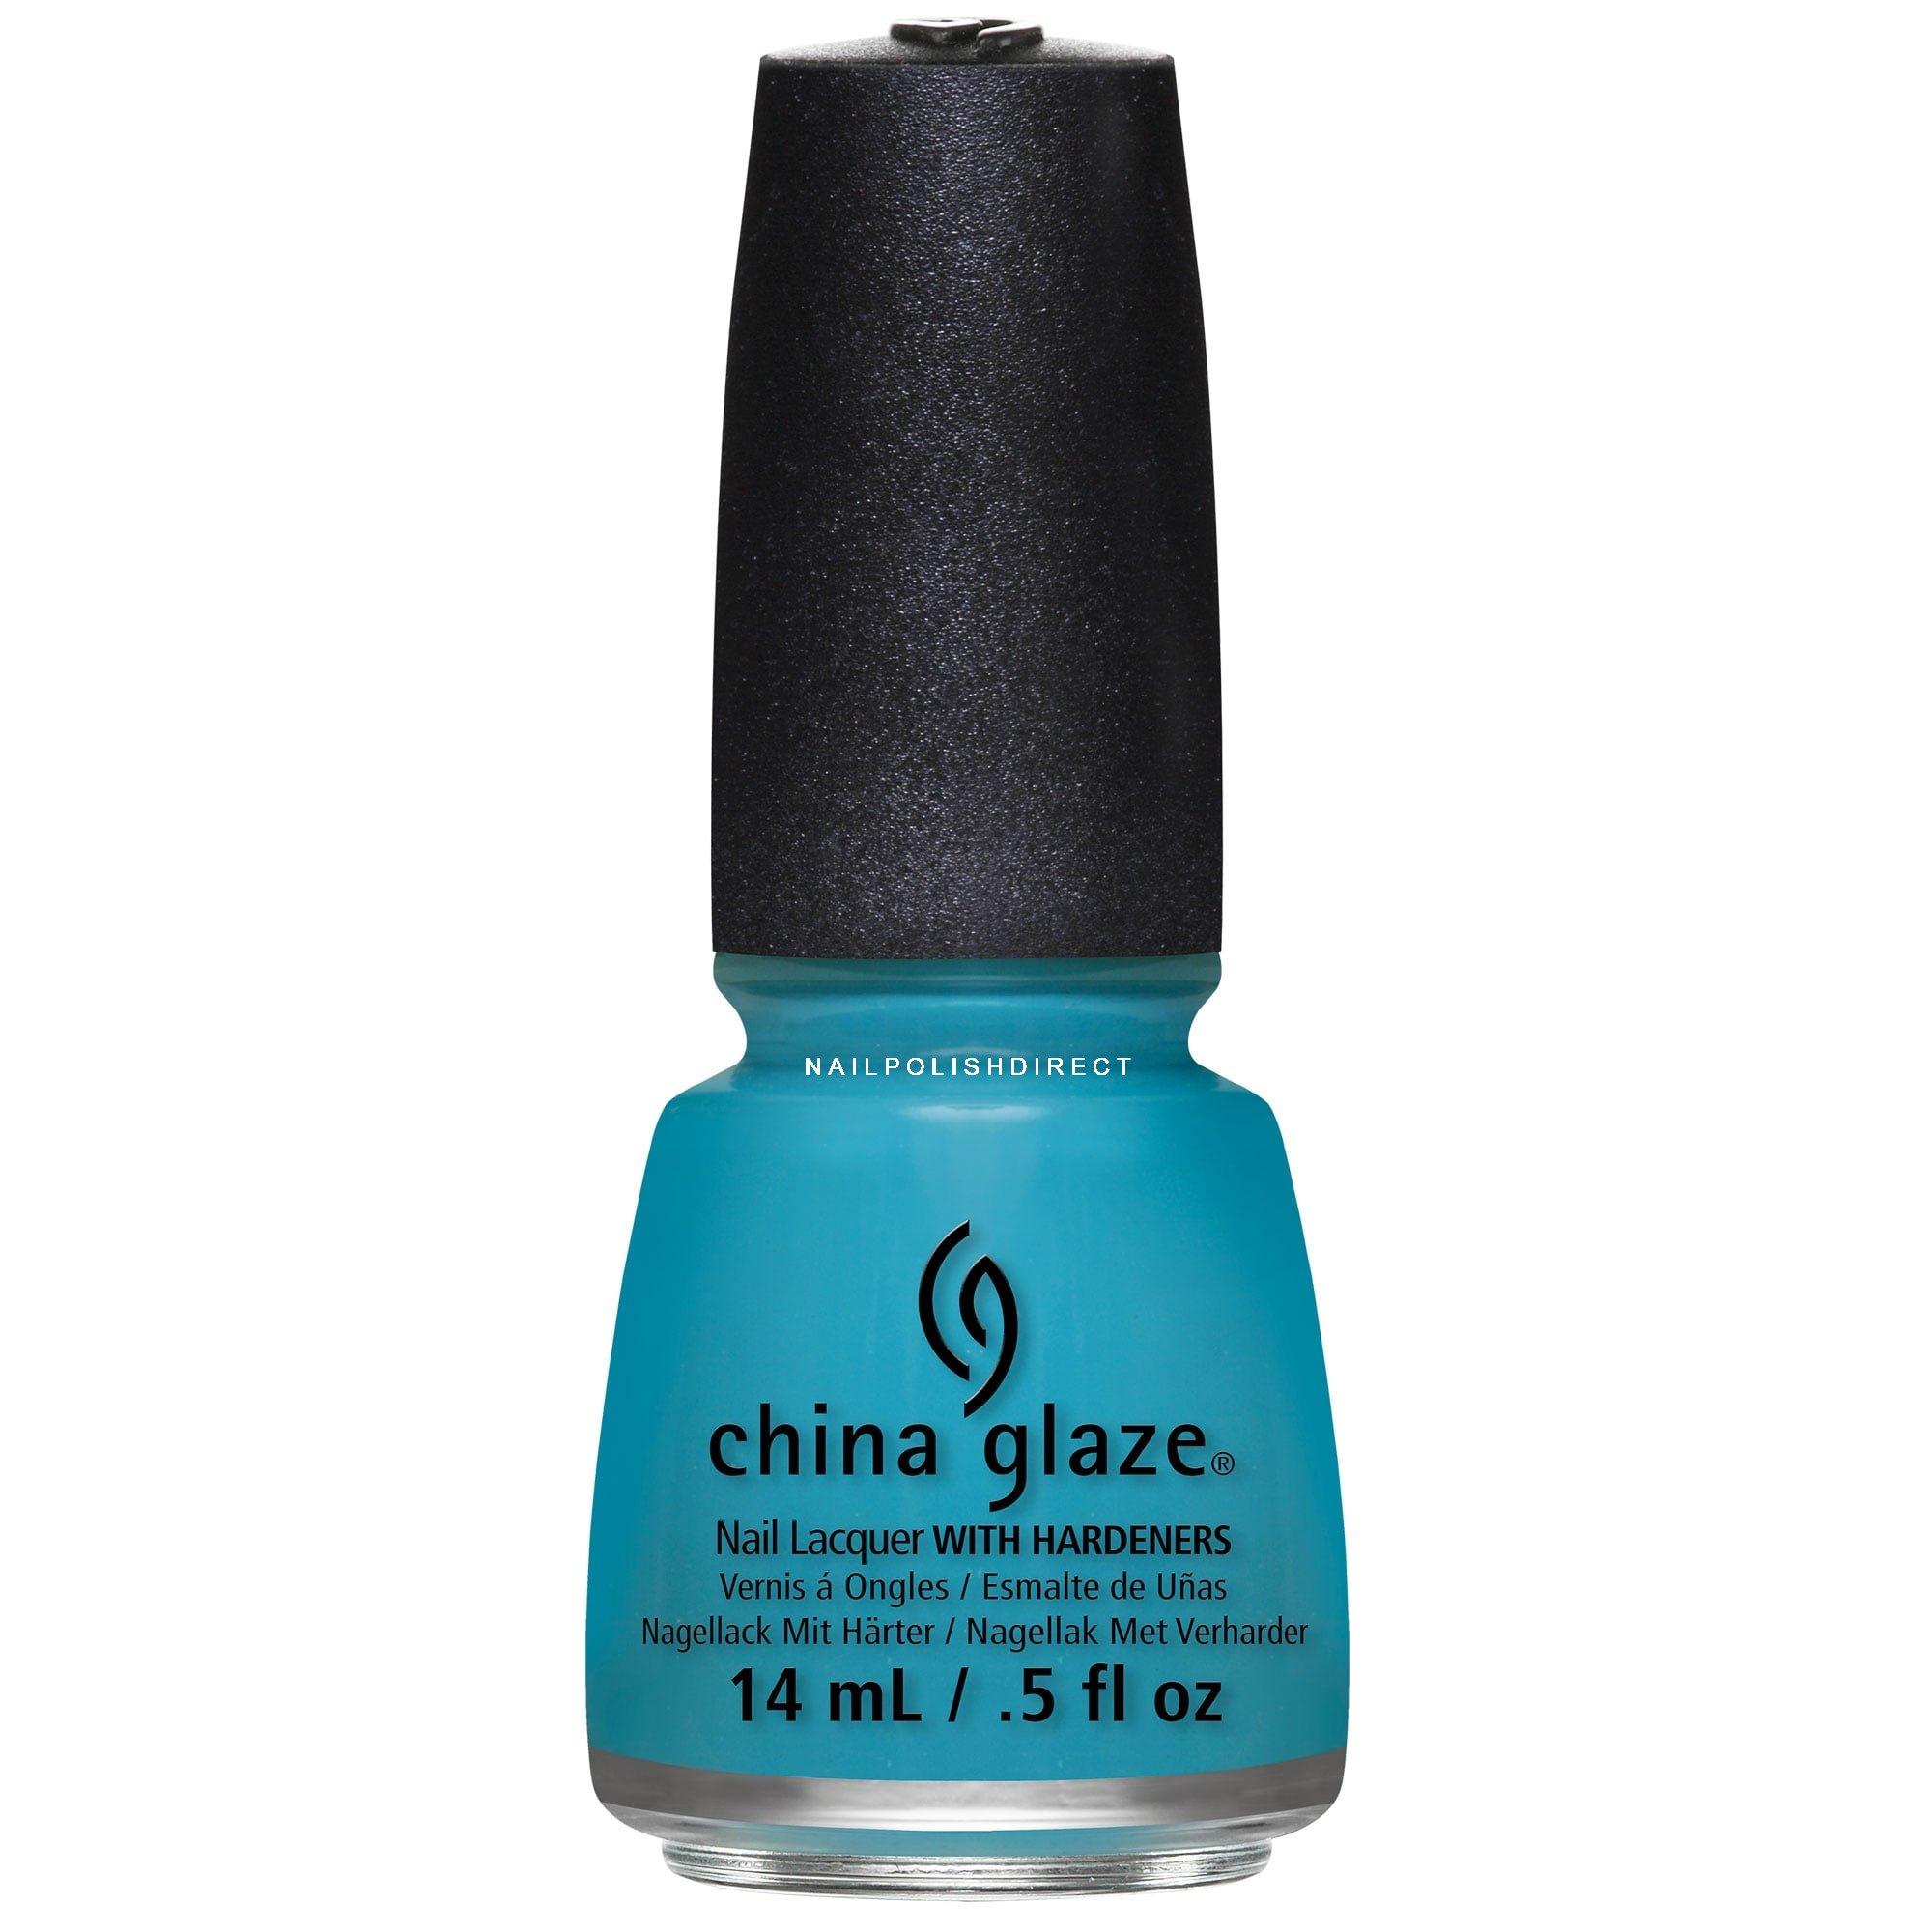 China Glaze Grey Nail Polish: China Glaze Off Shore Nail Polish Collection 2014